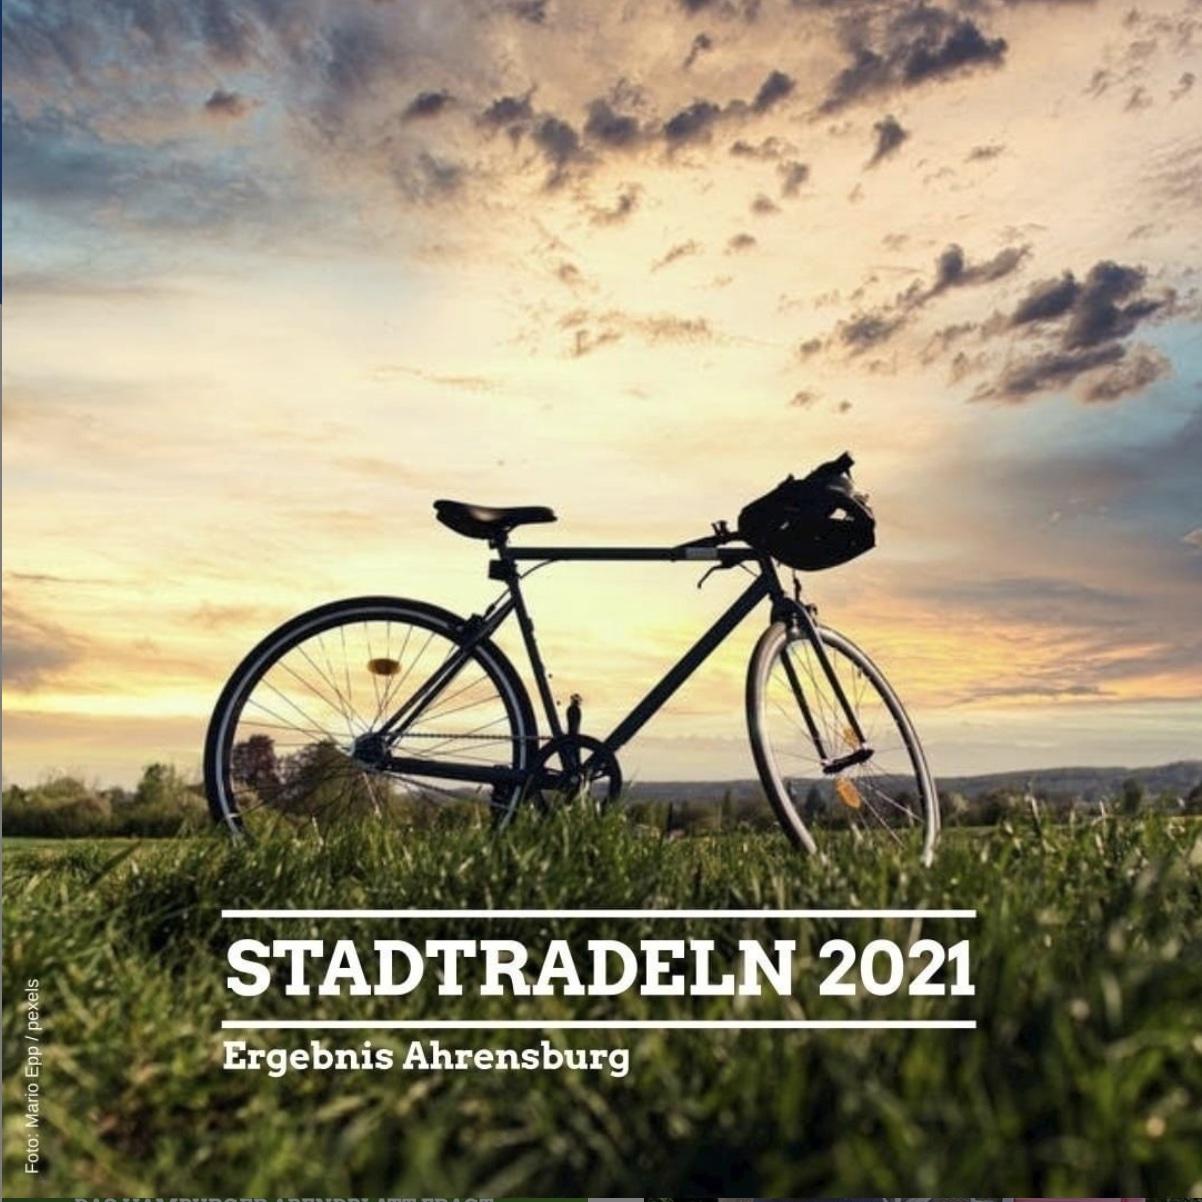 Über 1.000 Ahrensburger beim Stadtradeln 2021